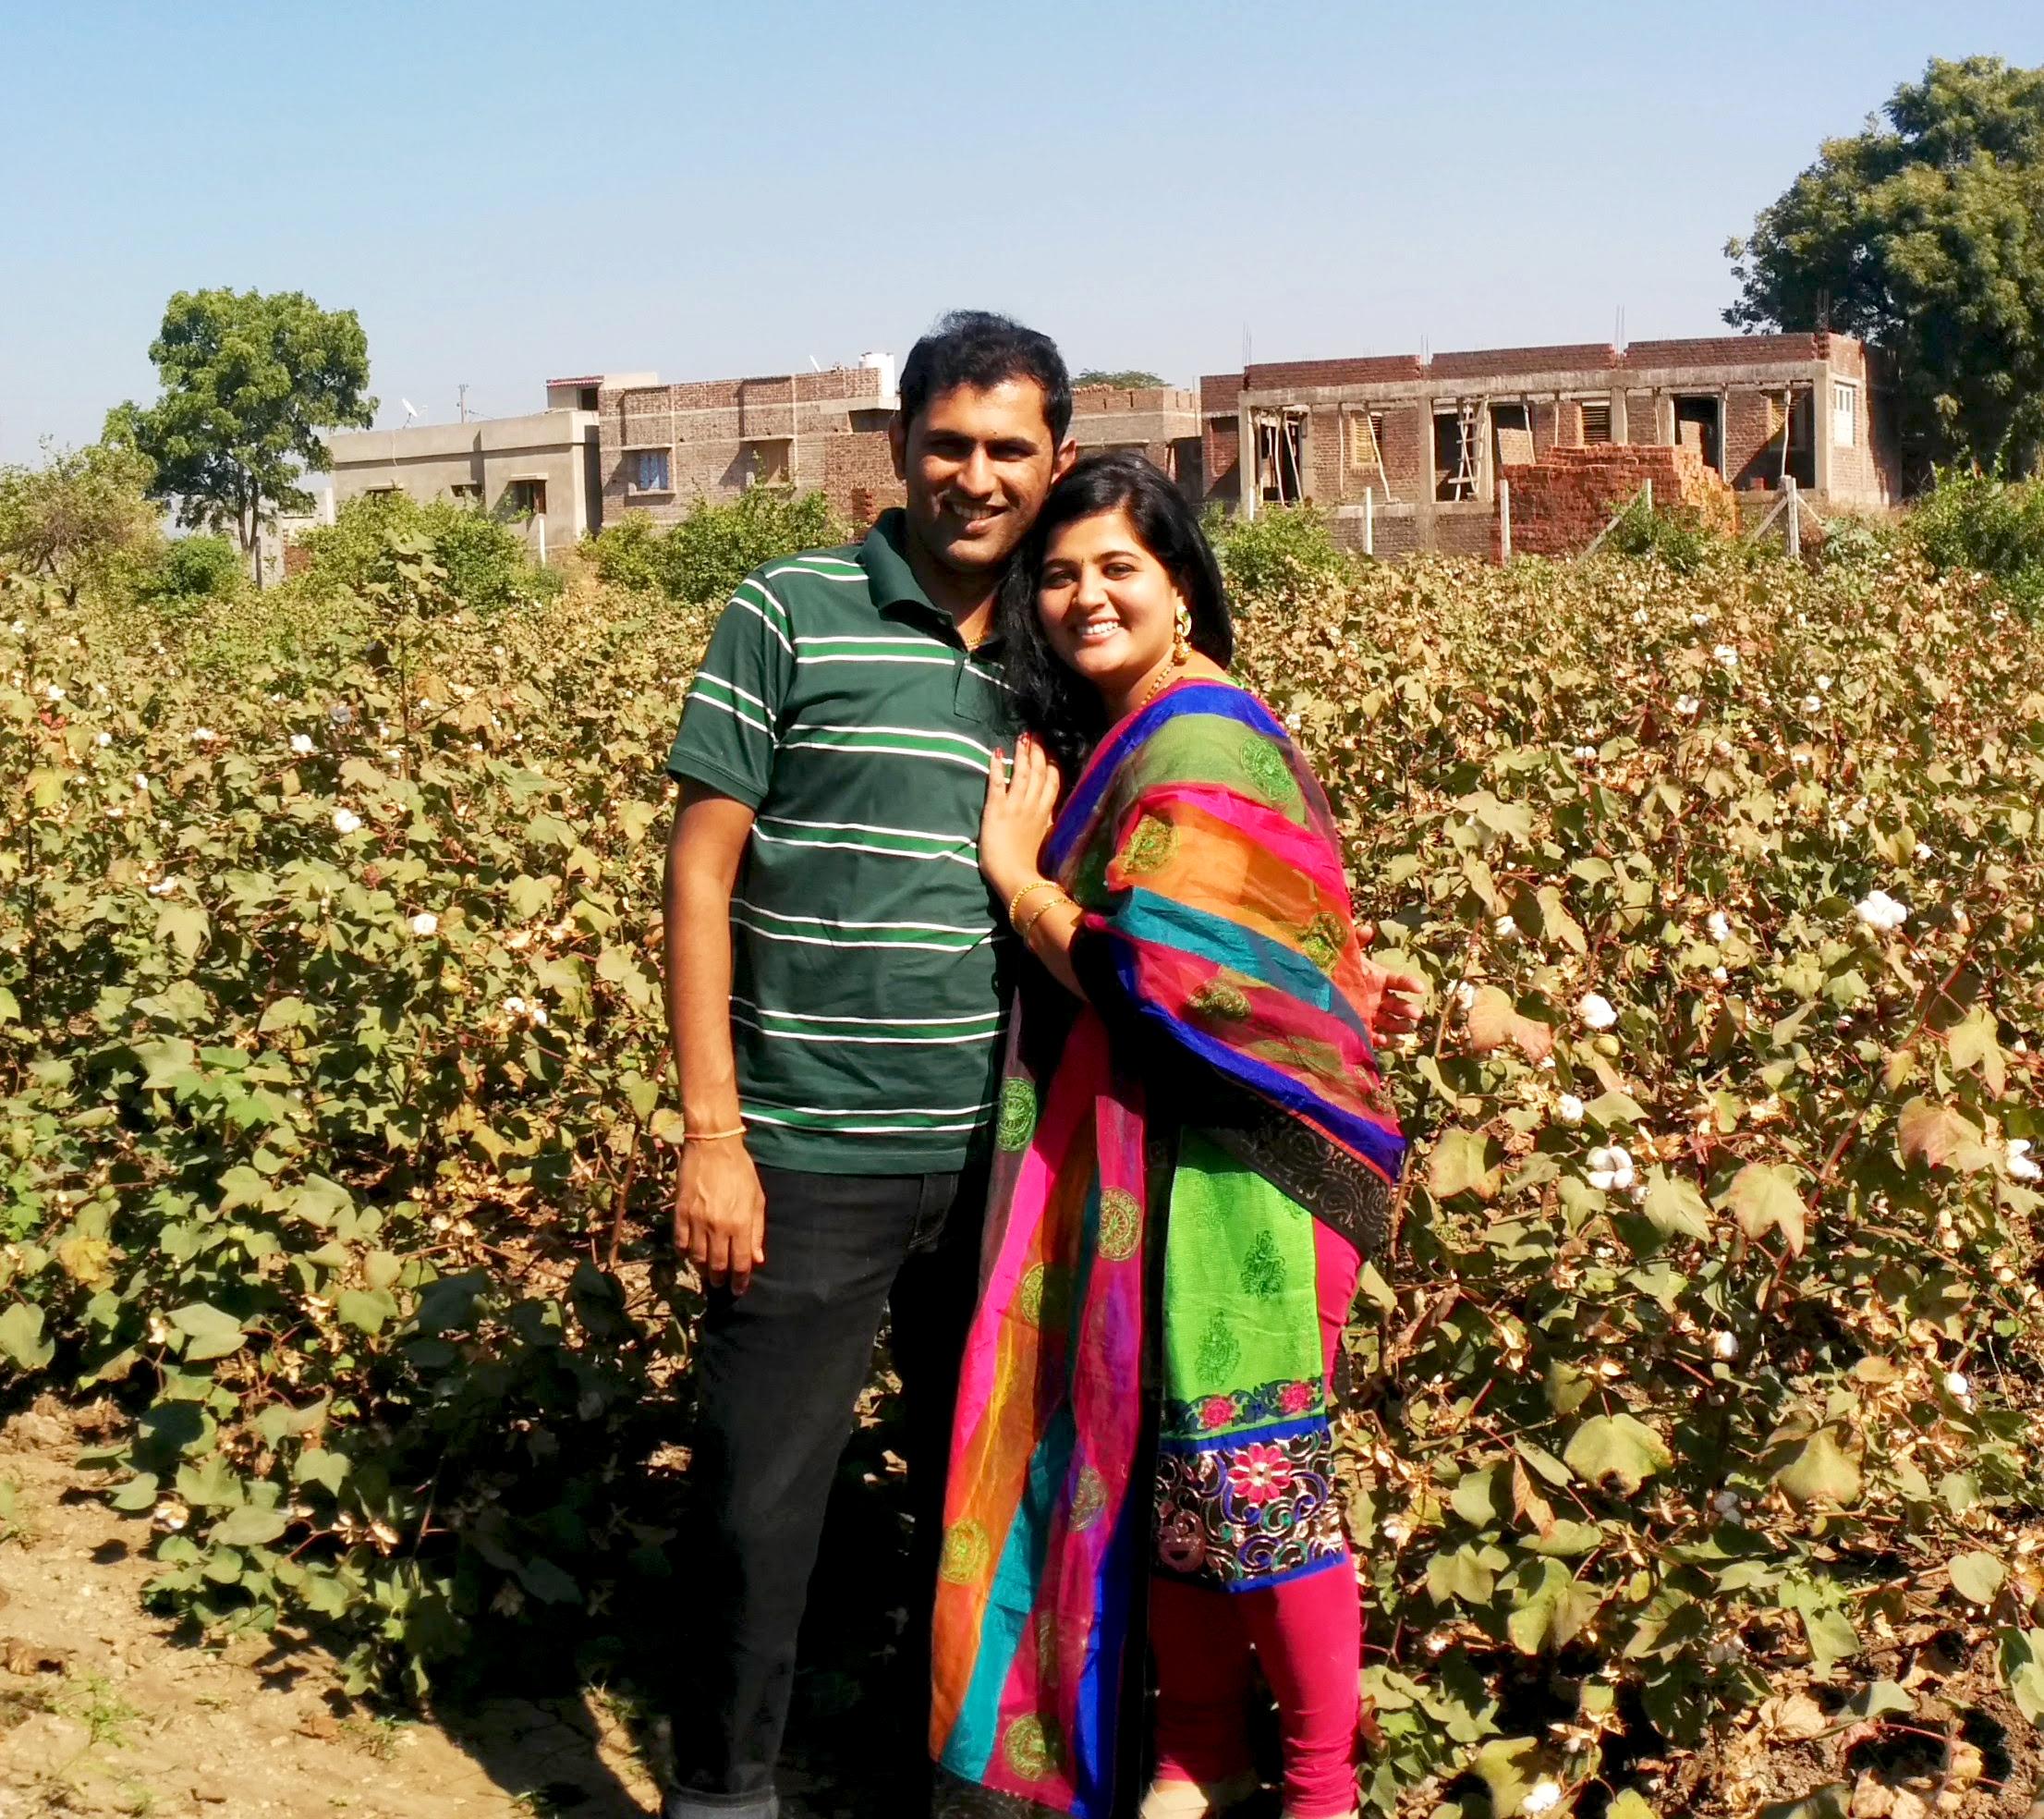 Era Londhe and Gaurav Golwalkar